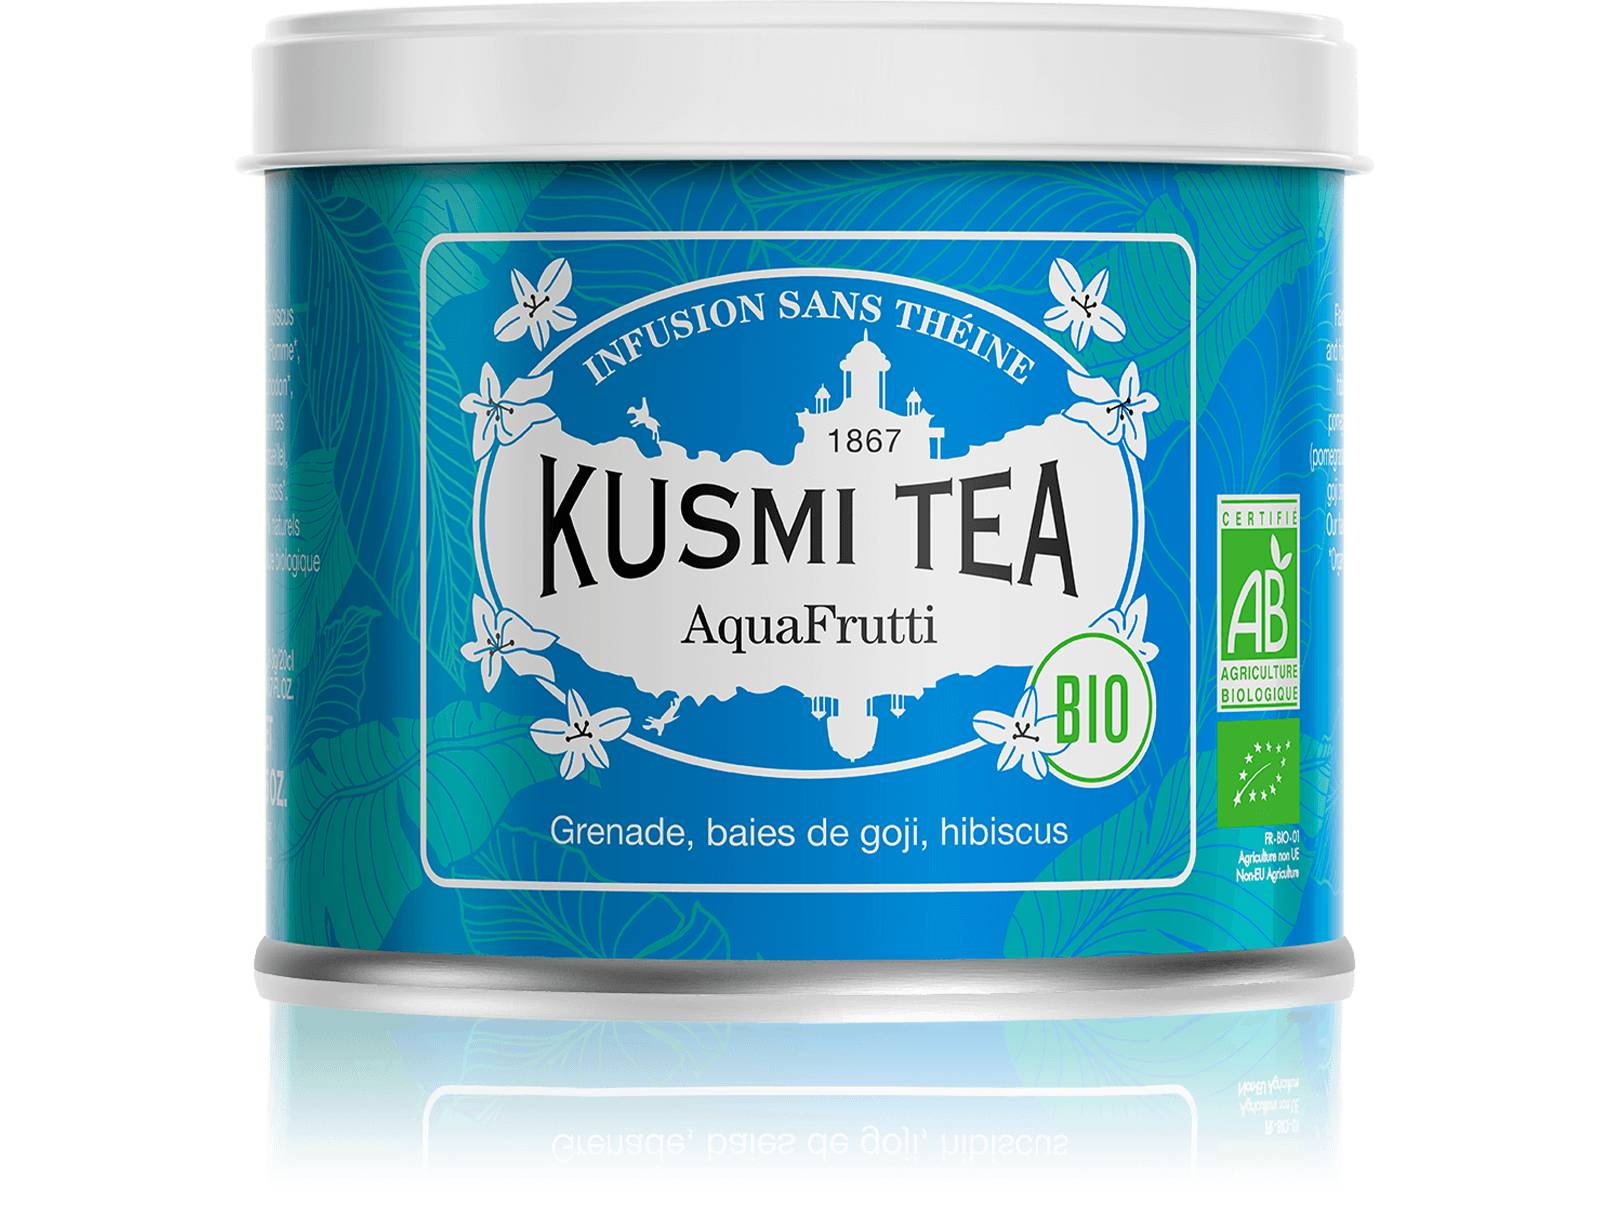 KUSMI TEA AquaFrutti (Infusion de fruits bio) - Infusion hibiscus, baies de goji - Kusmi Tea